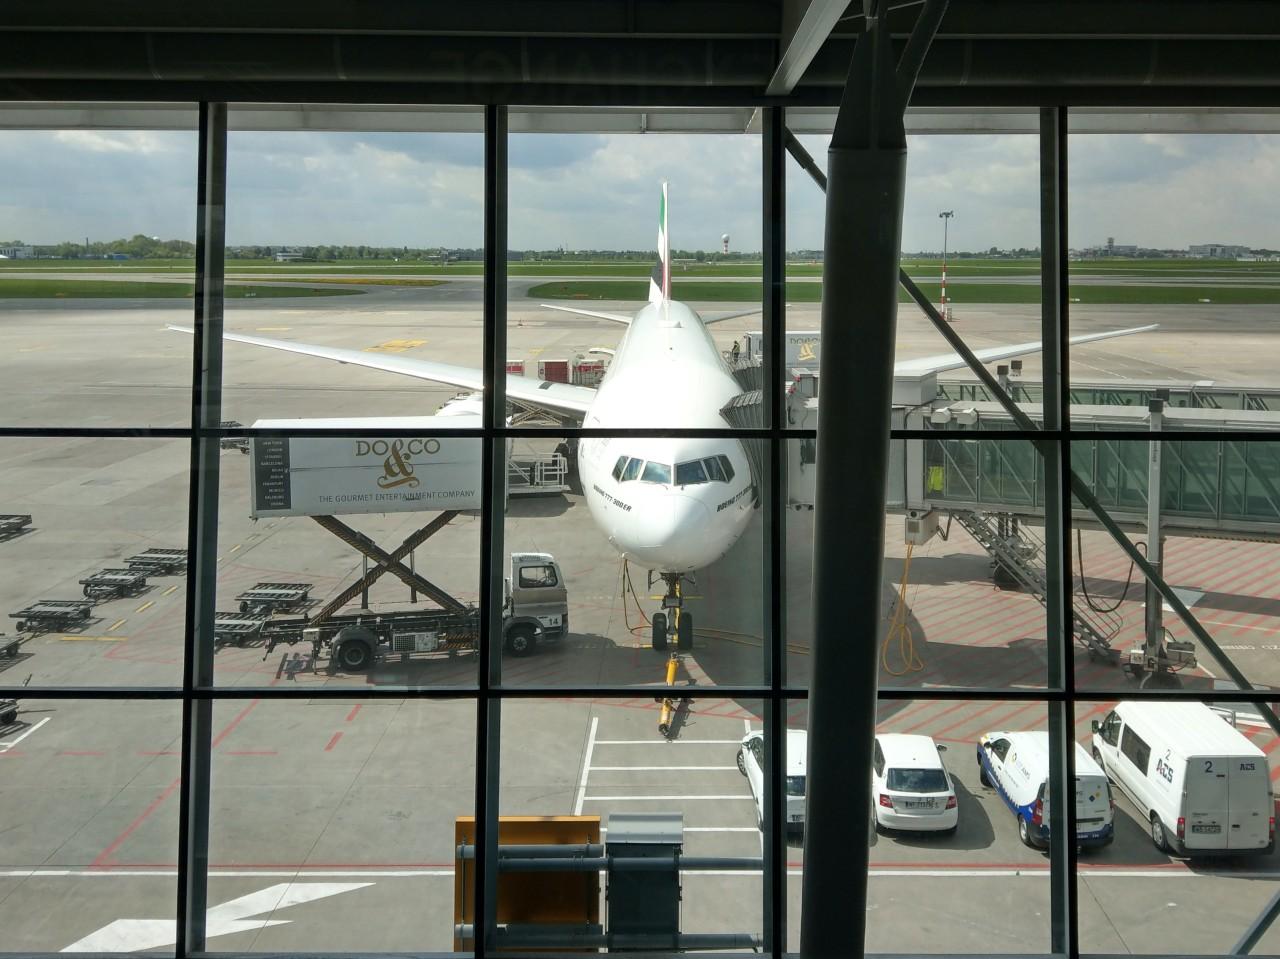 Emirates Boeing 777-300ER - Lotnisko Chopina - Chopin Airport